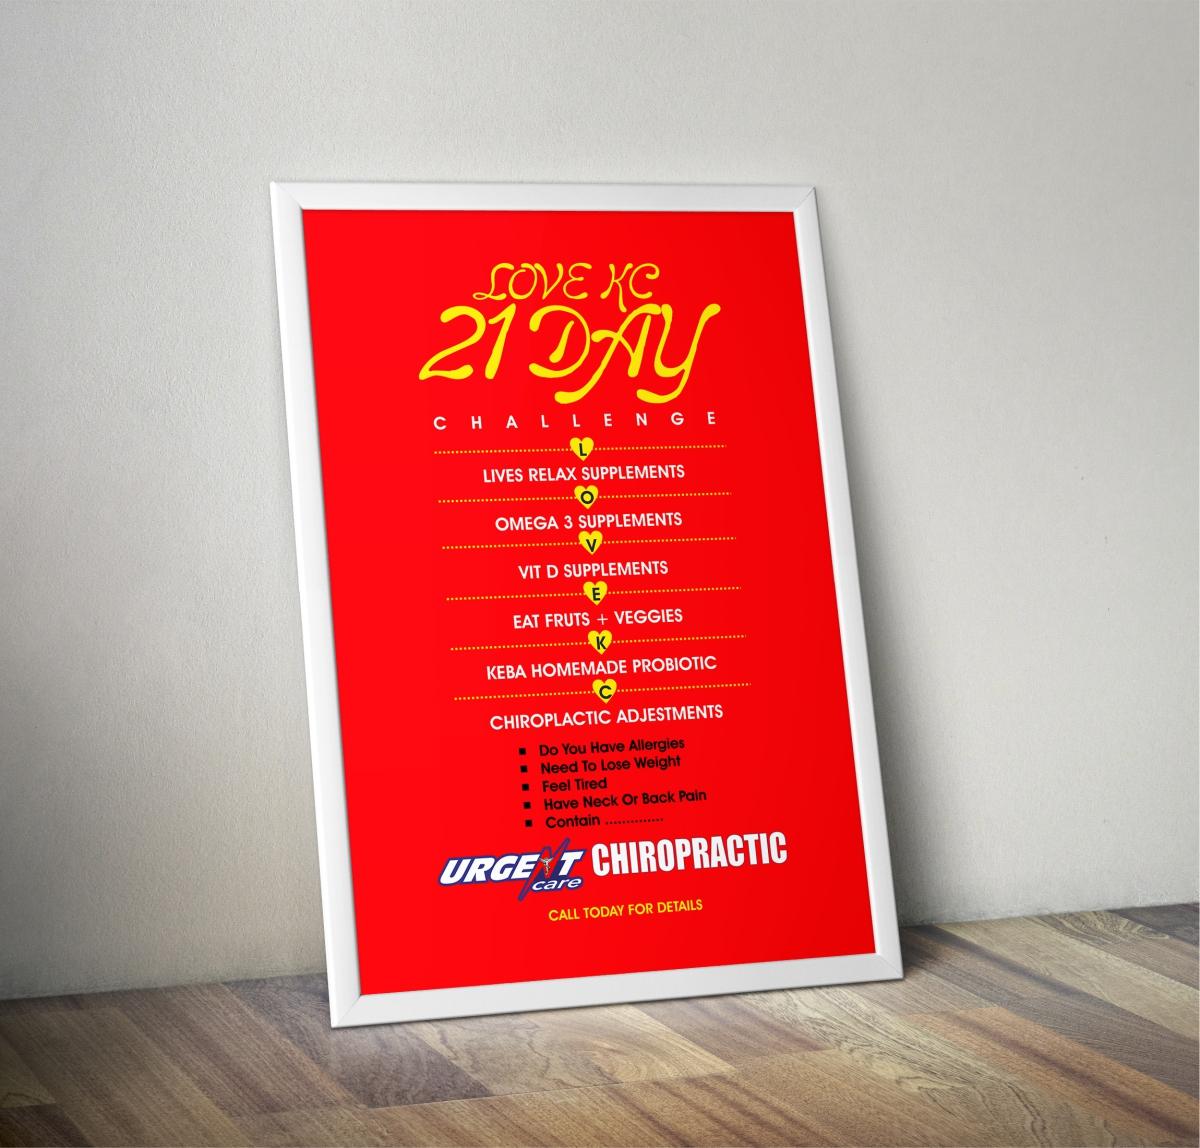 Poster design inspiration -  Poster Design For Love Kc 21 Day Challange By Cb1318cb1318